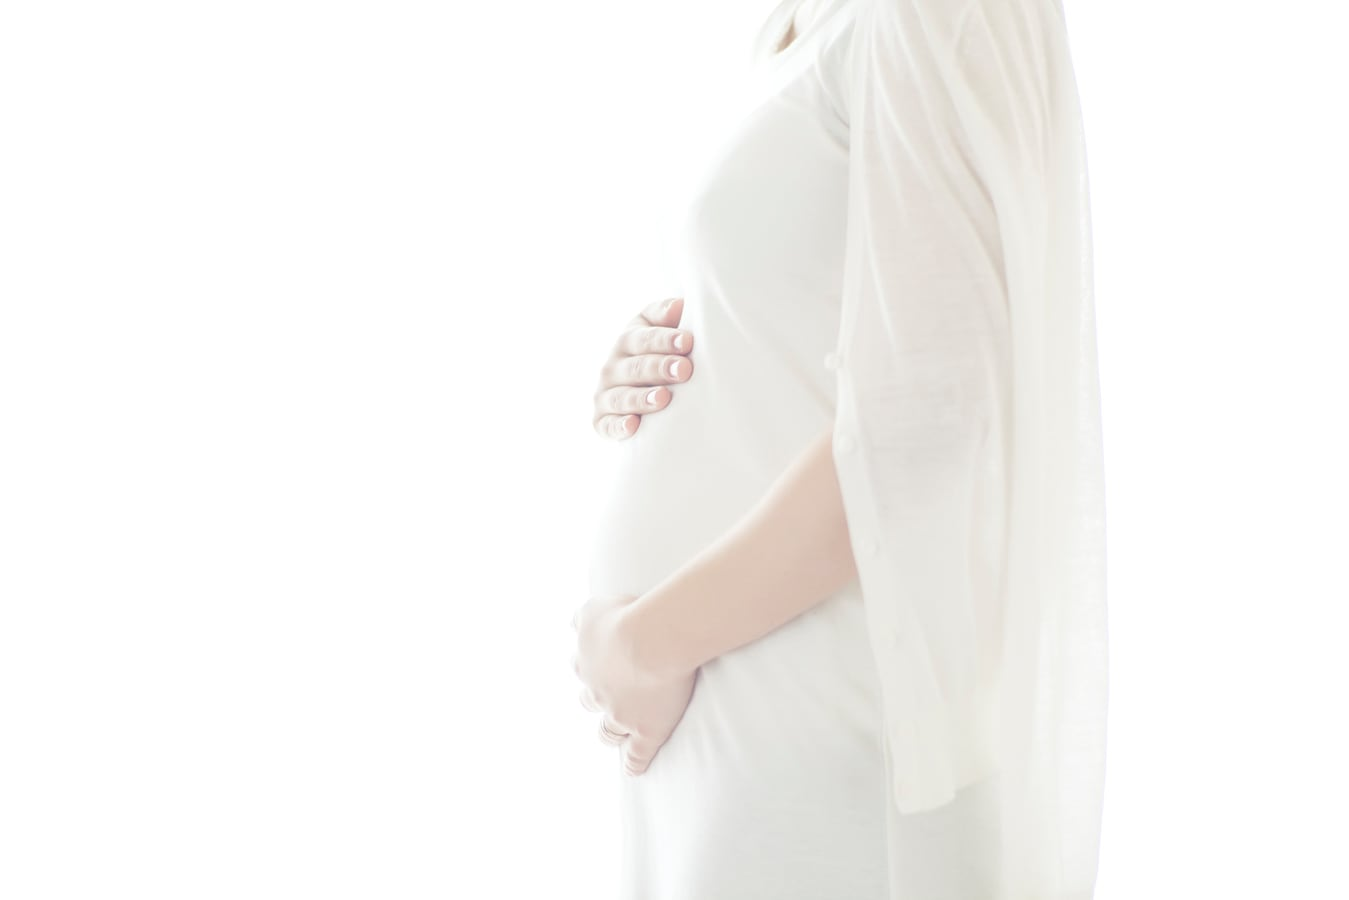 知恵袋 胎児 スープ